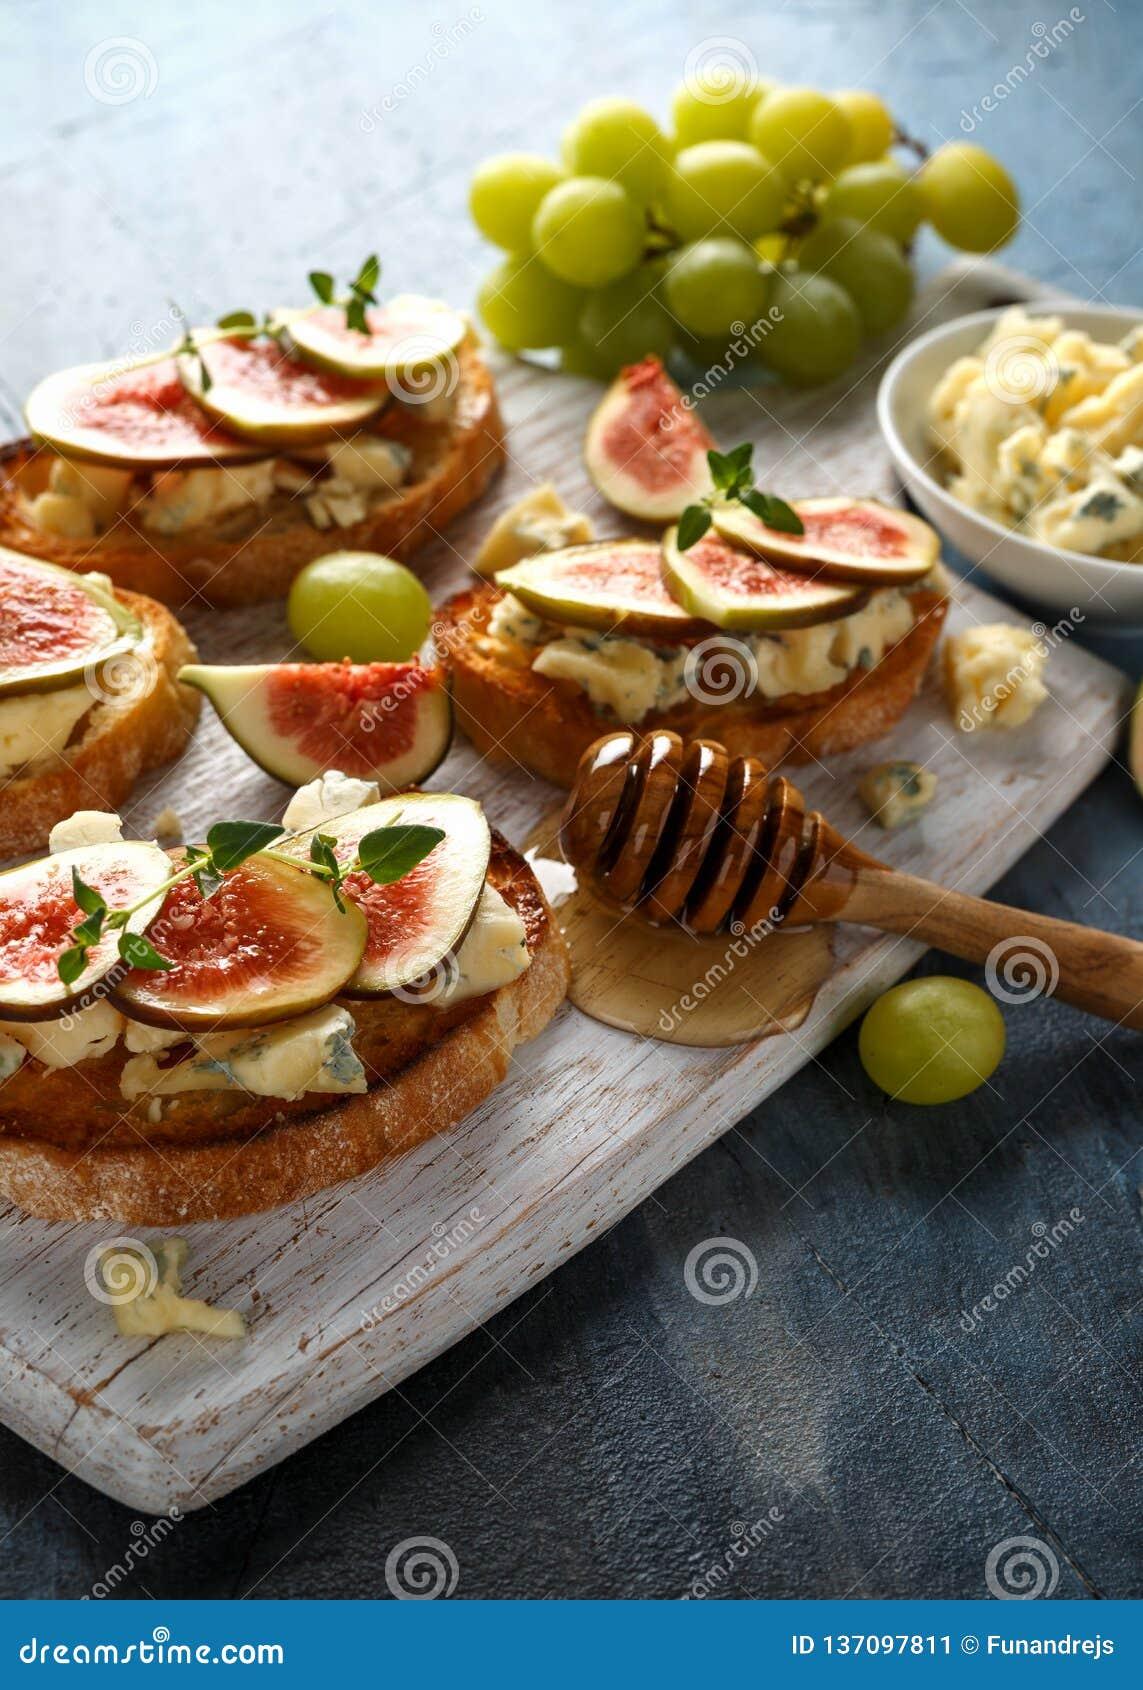 Dit Fig. en Gorgonzola-tartines, toost, bruschetta gemotregend met honing op witte houten raad